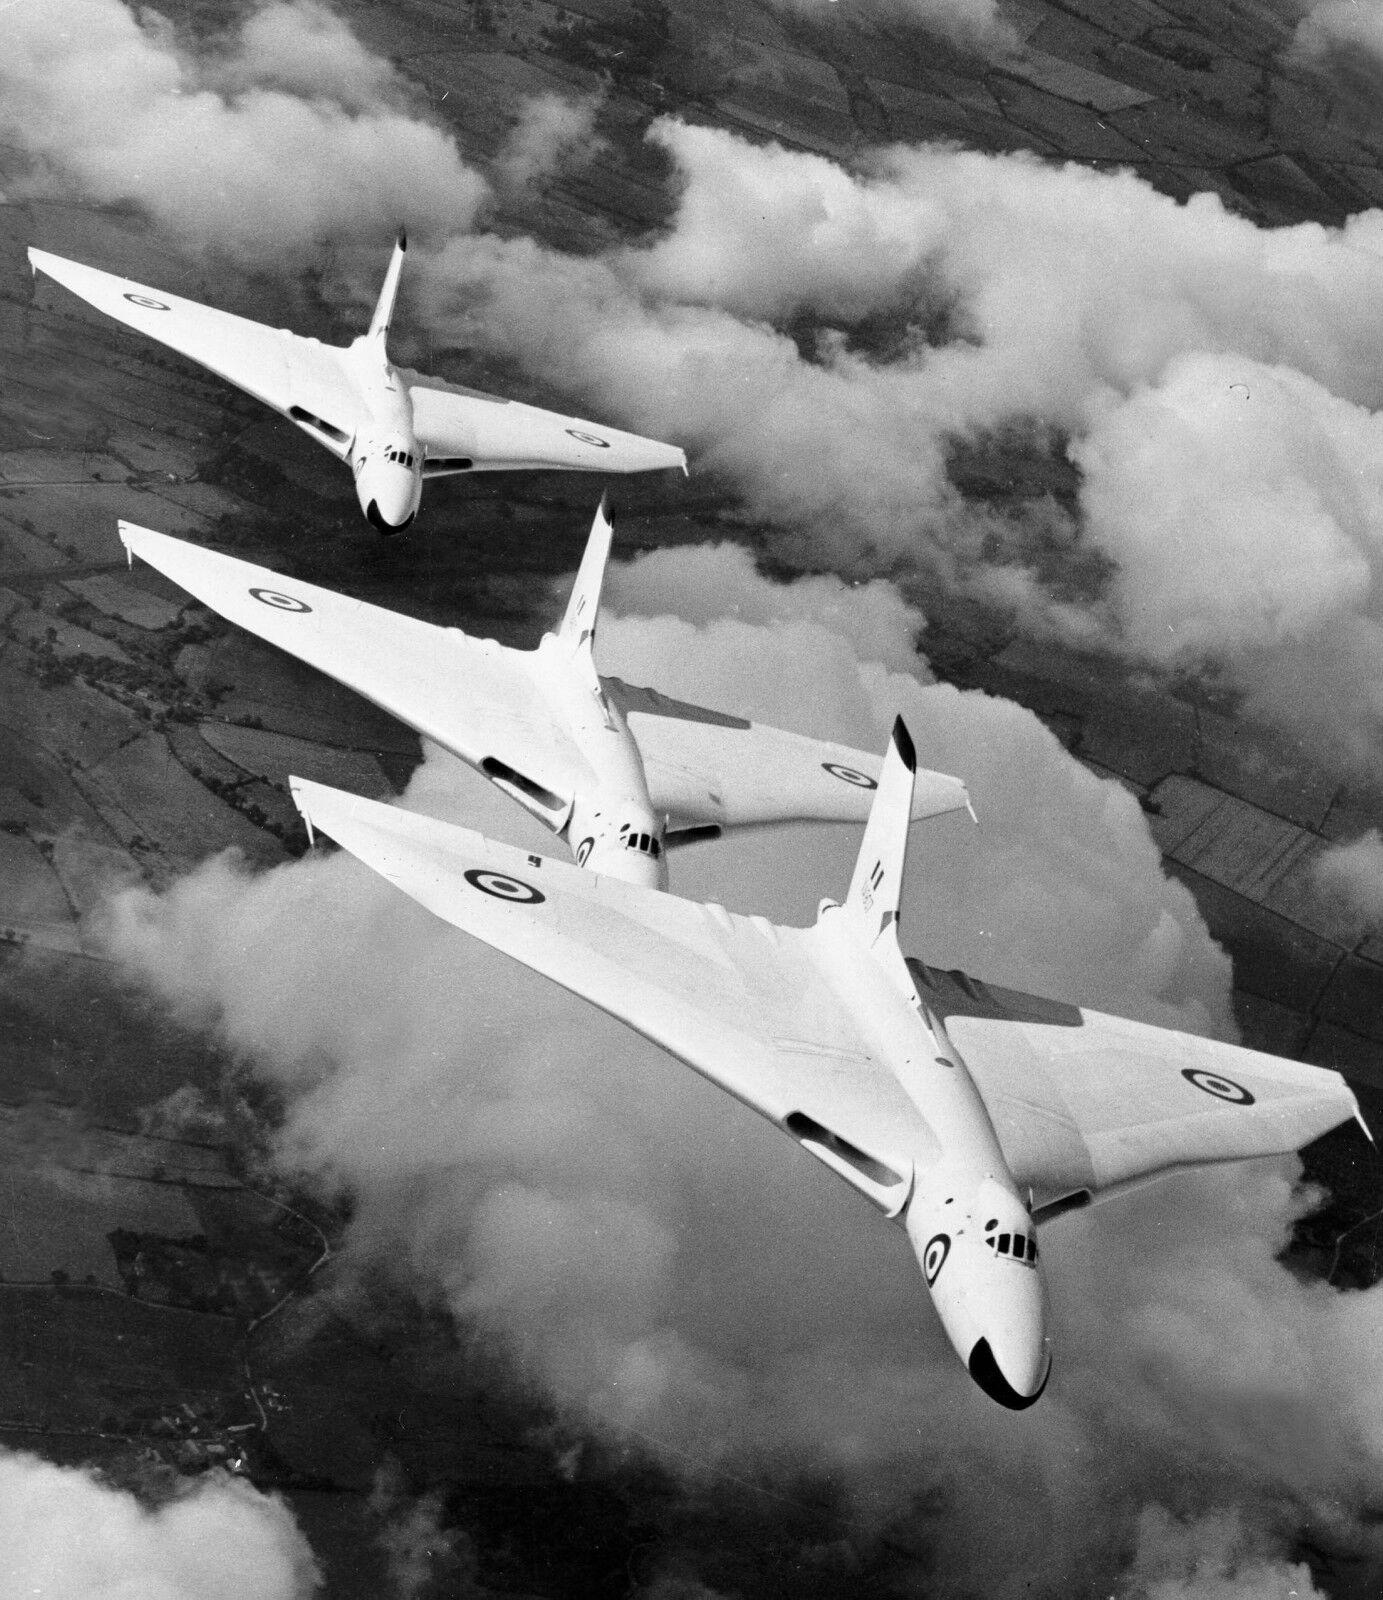 1957 RAF VULCAN BOMBER AIRCRAFT  Photo Print